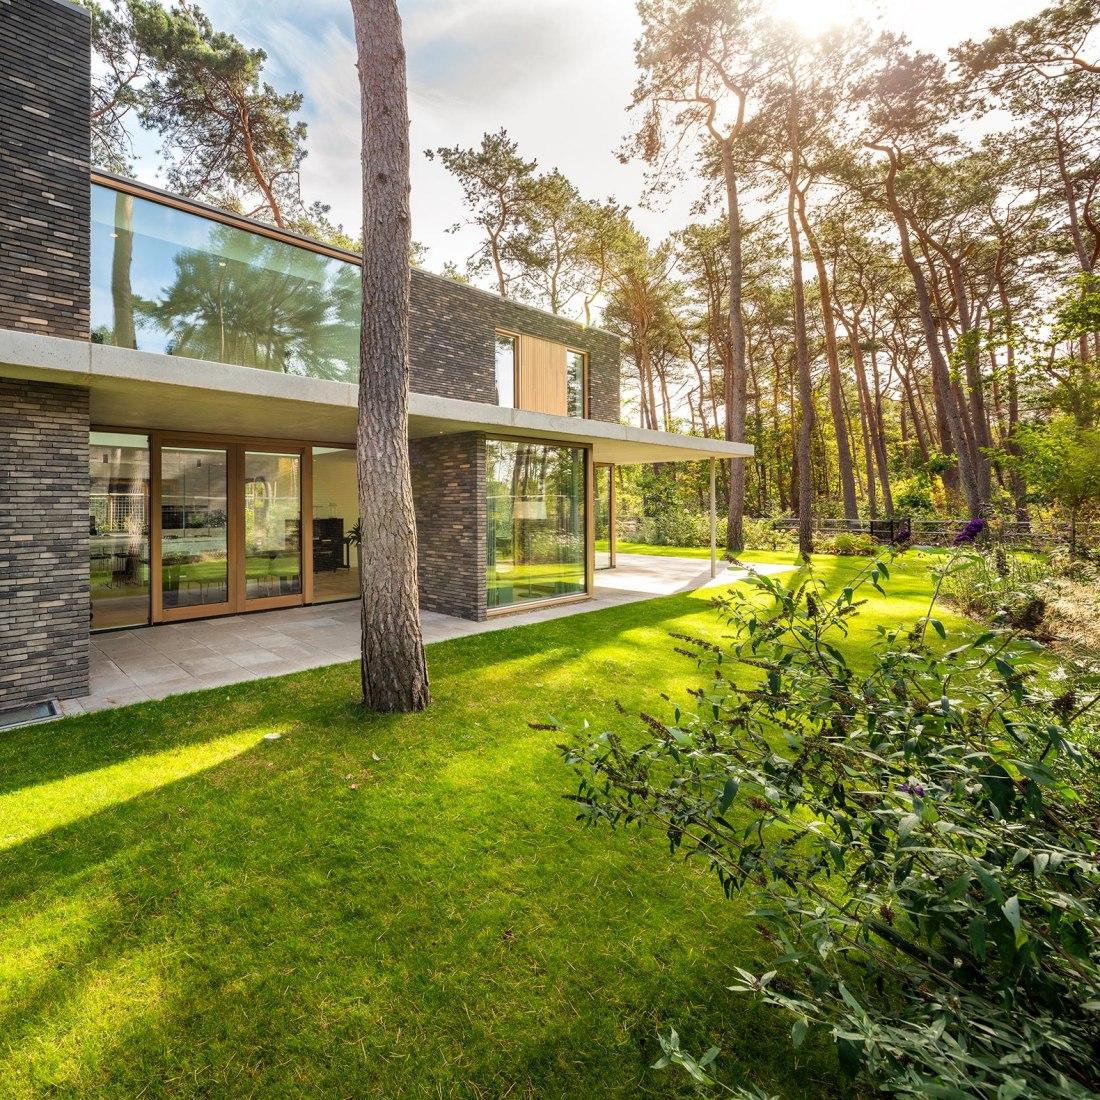 Villa Zeist 2 por HofmanDujardin. Fotografía por Matthijs van Roon